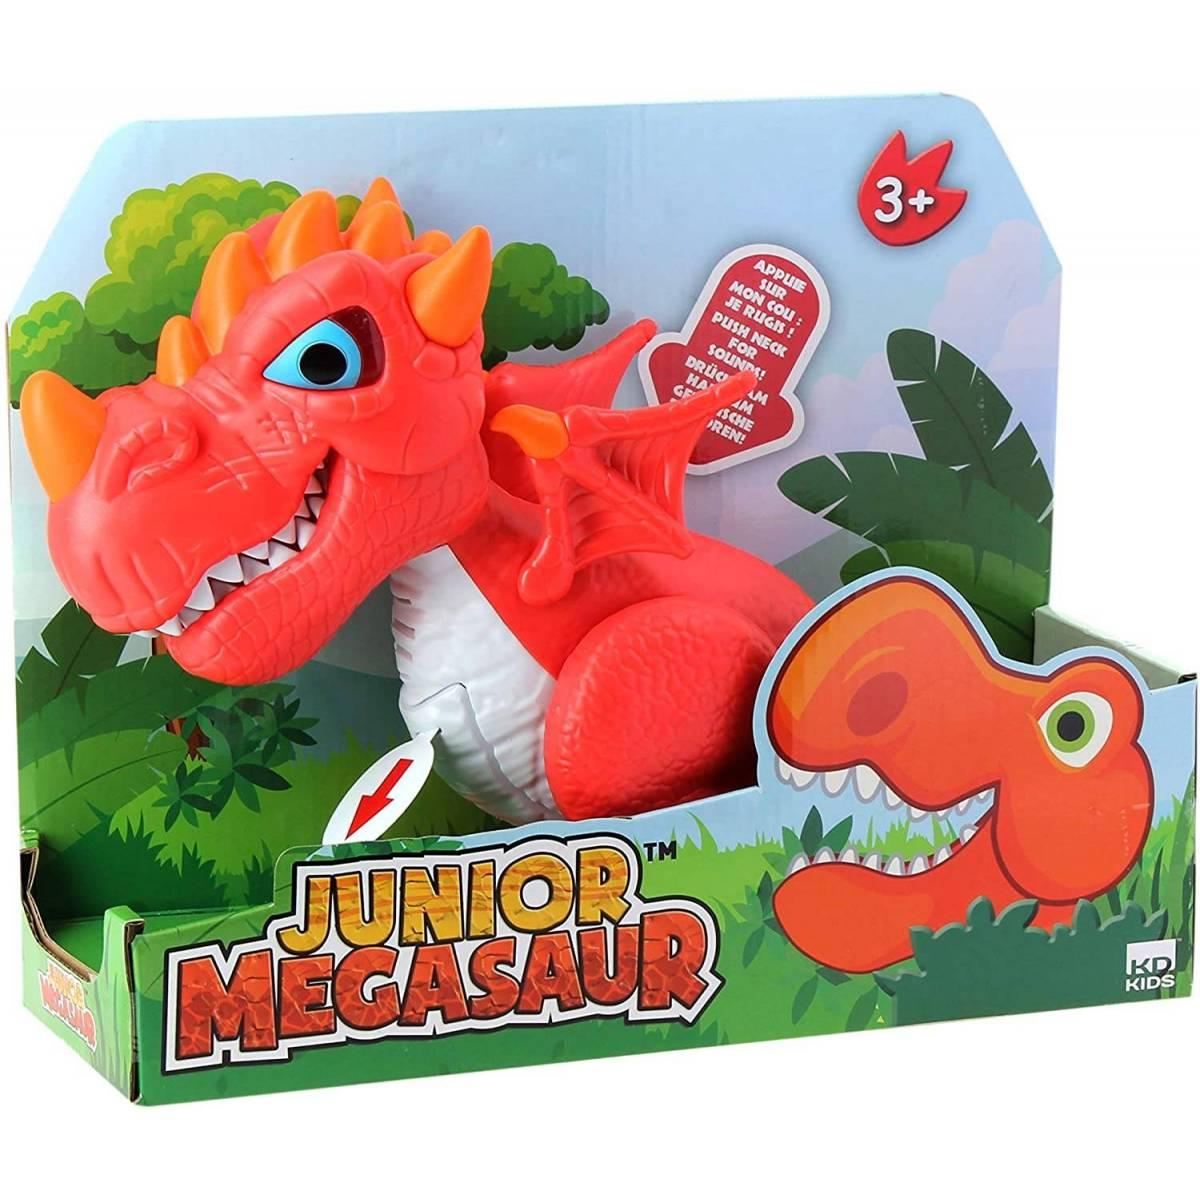 Dragonsaurus Rouge Interactif Junior Megasaur